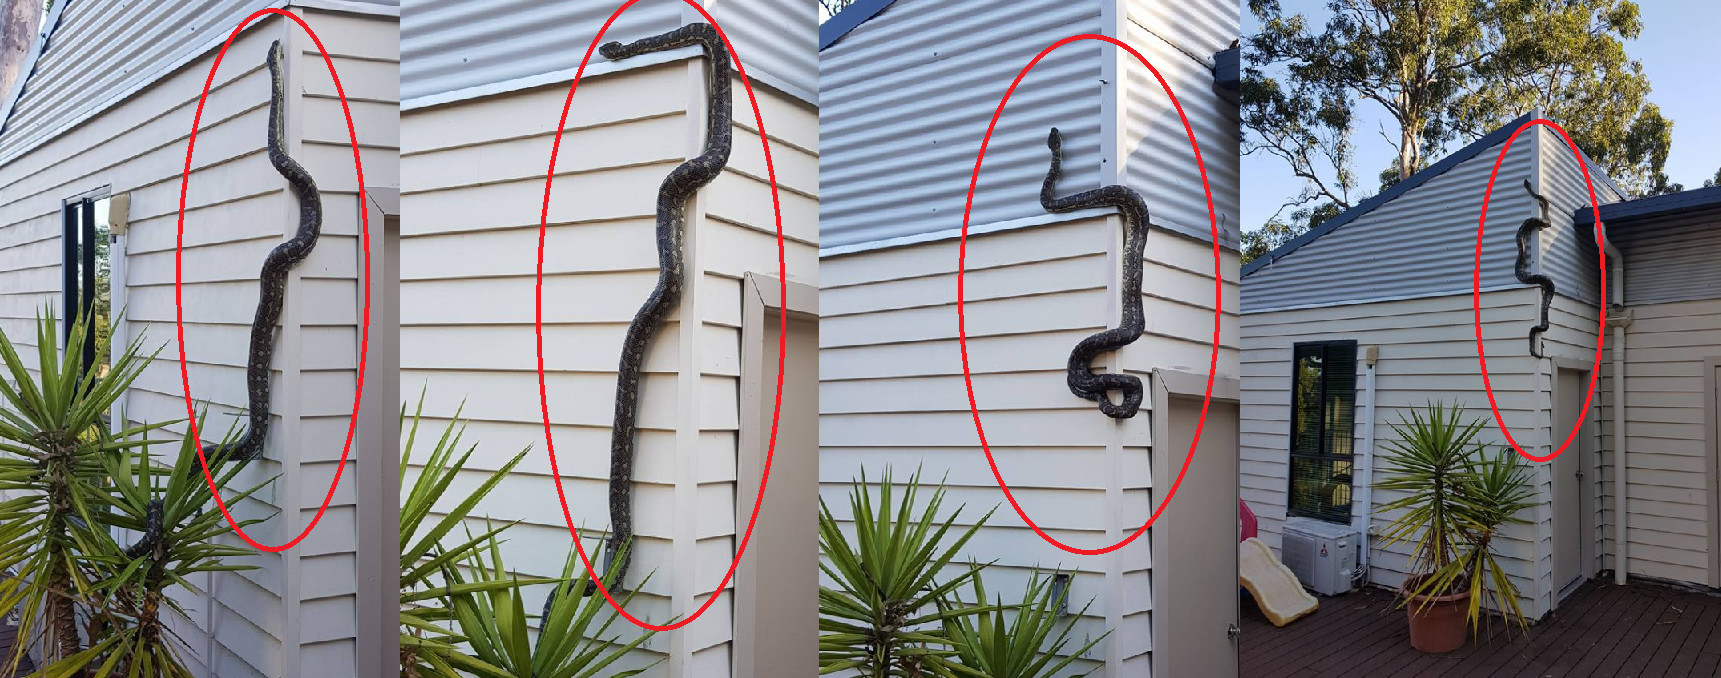 3m巨蟒会吊挂屋顶「打招呼」 澳洲男乐跟它同居6个月!